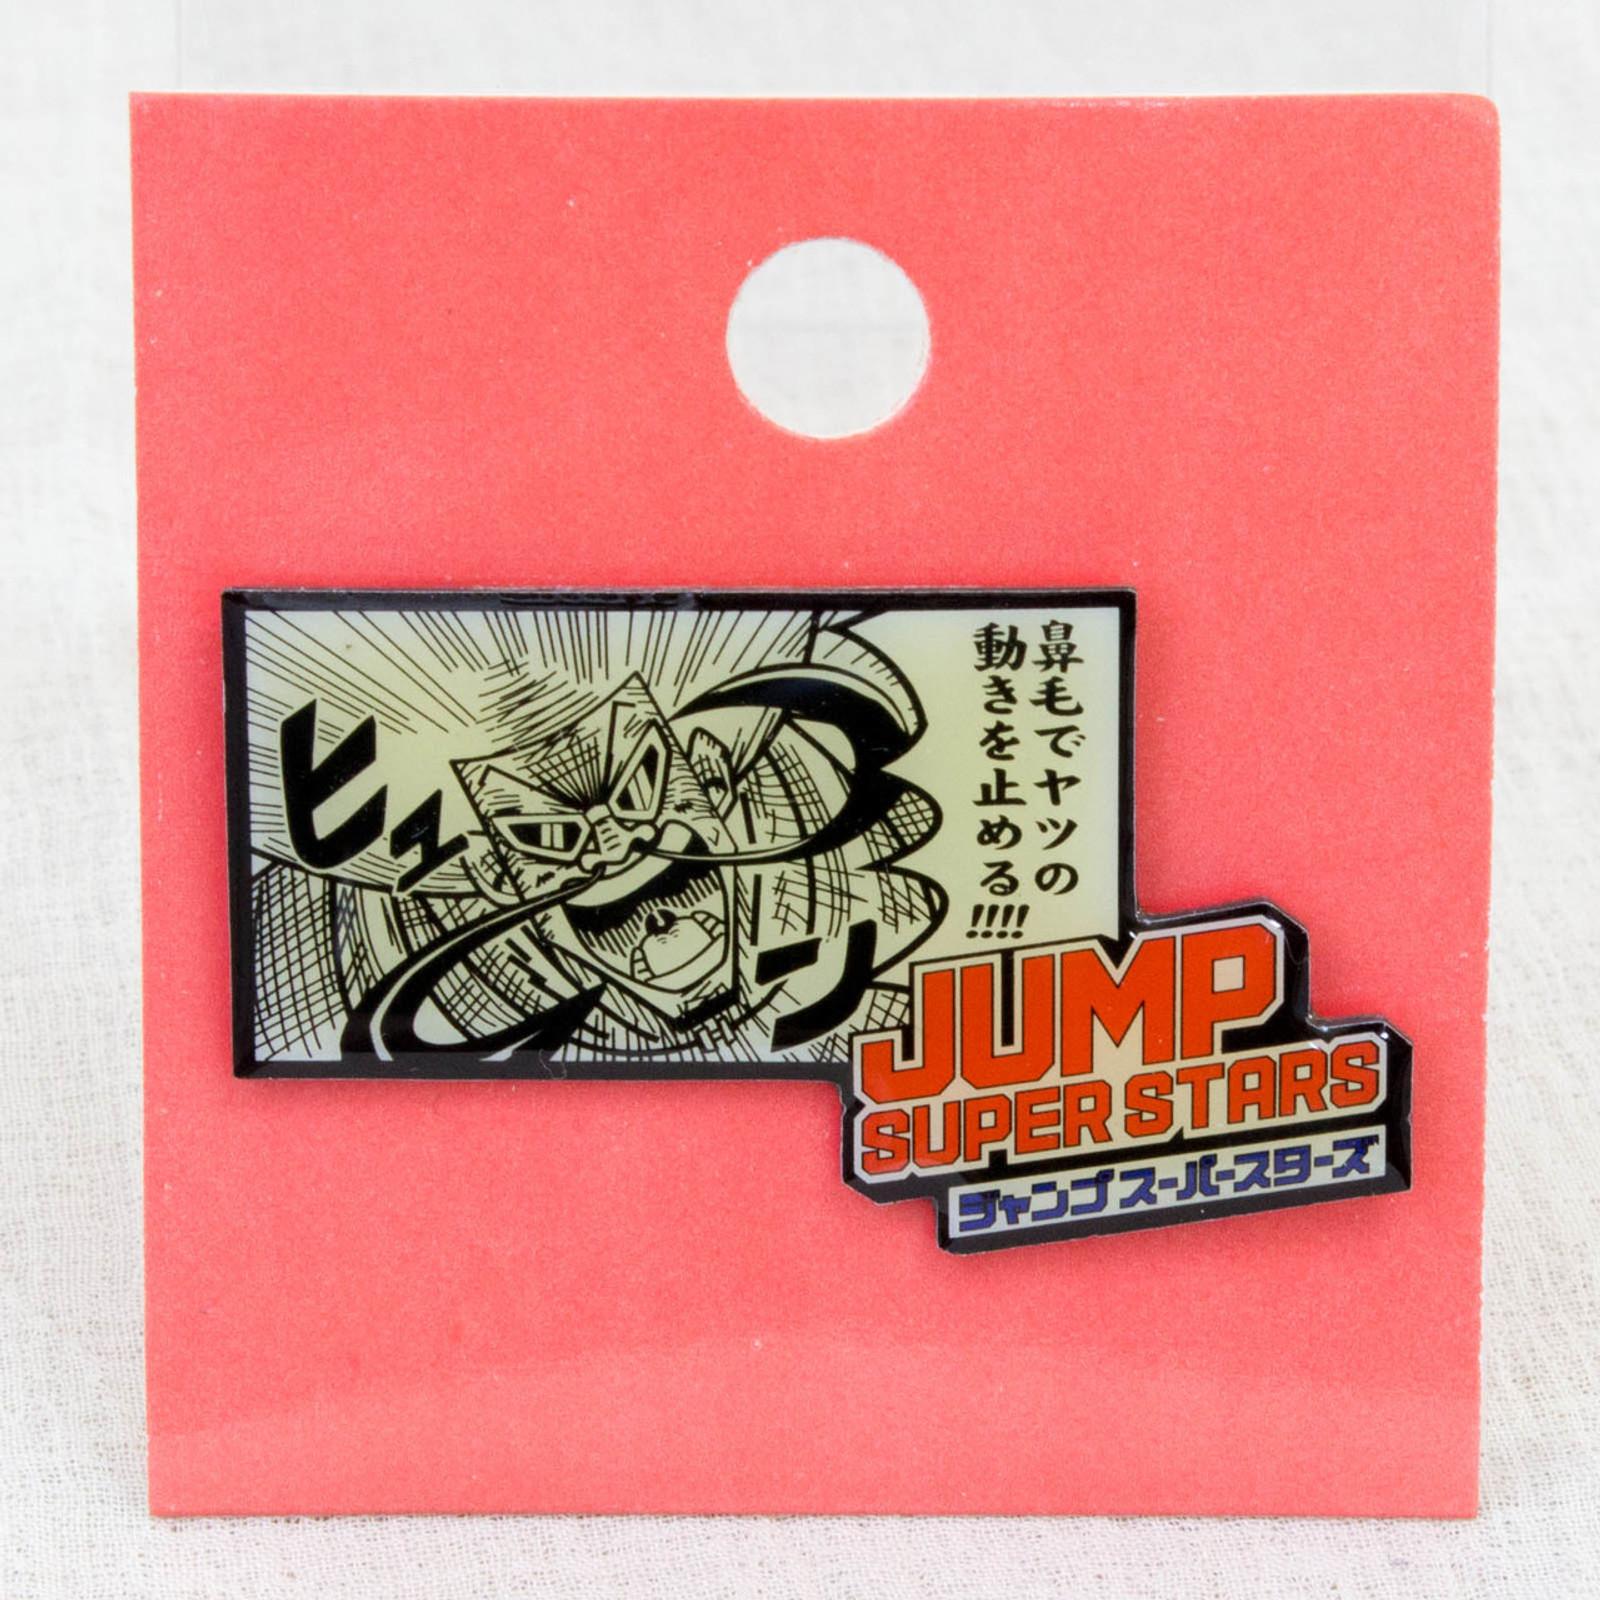 Shonen Jump Super Stars Pins Bobobo-bo Bo-bobo JAPAN ANIME MANGA